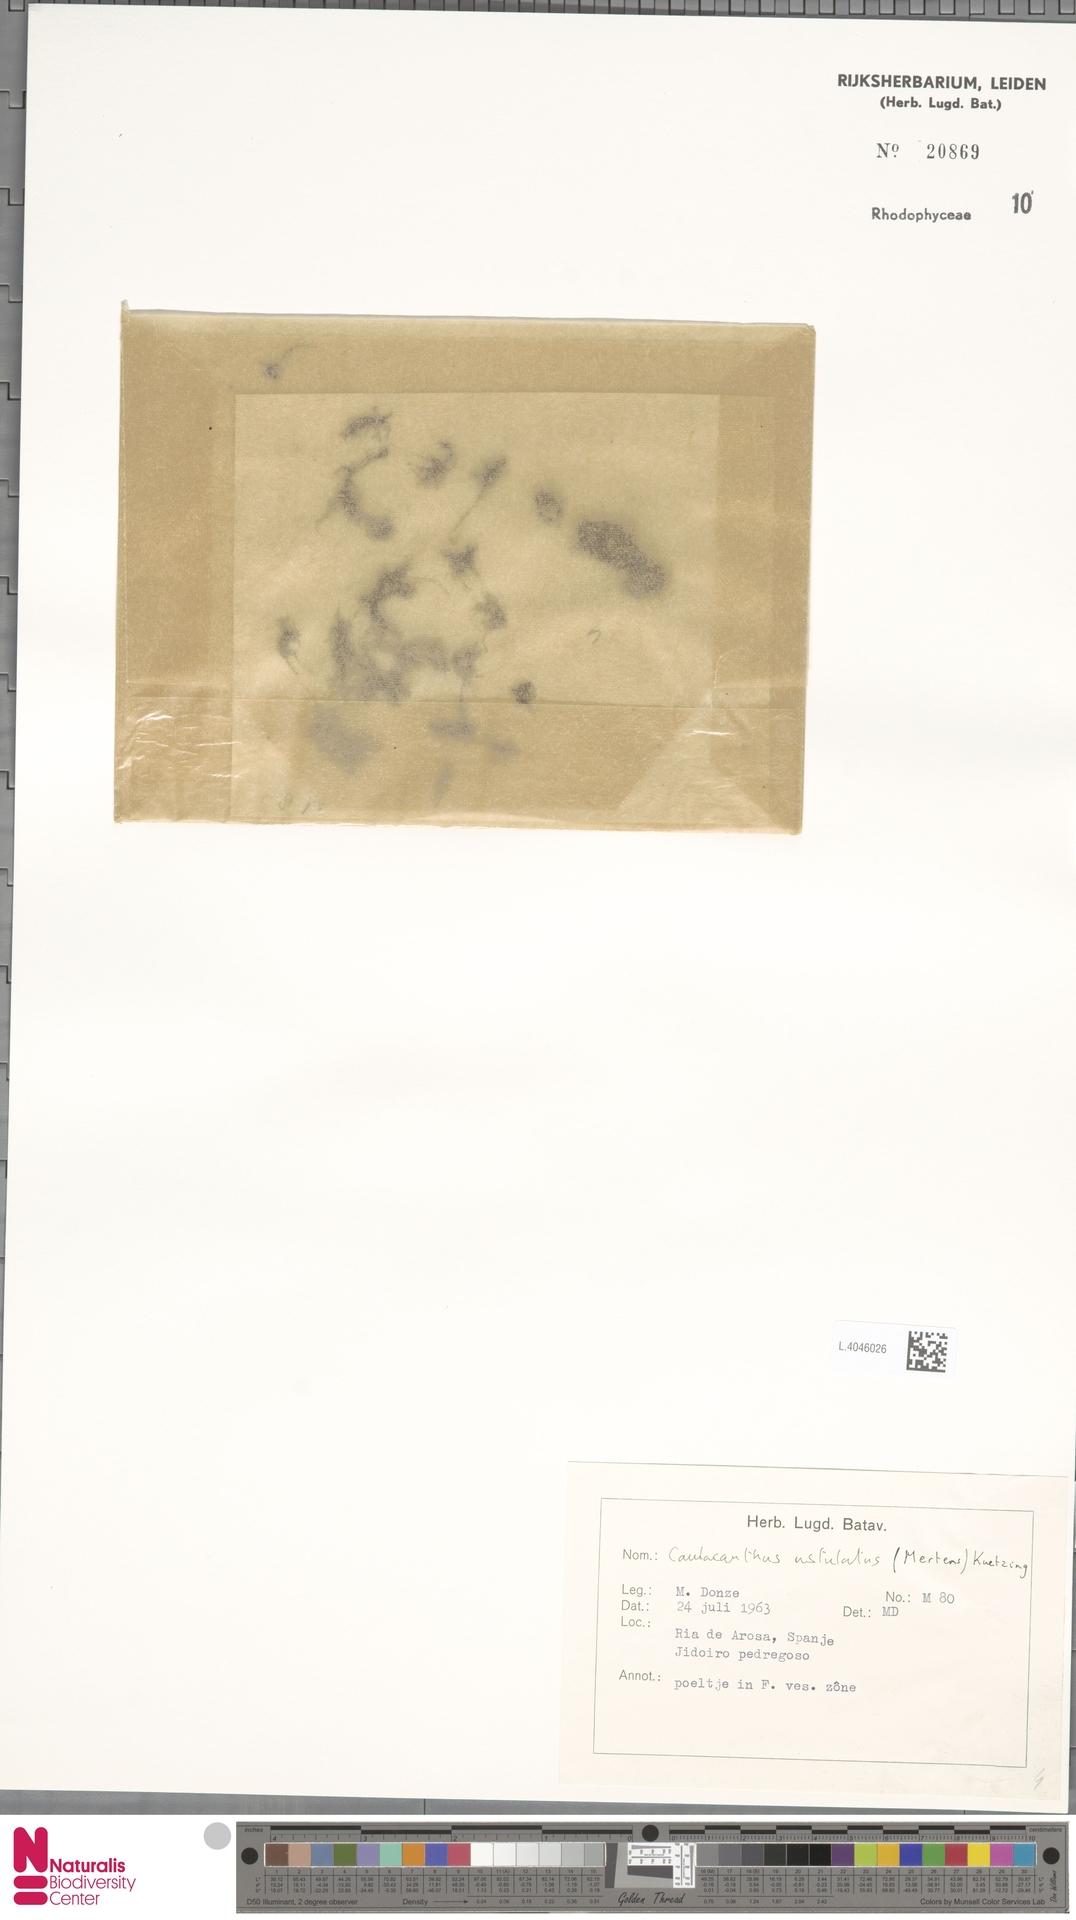 L.4046026 | Caulacanthus ustulatus (Mert.) Kütz.